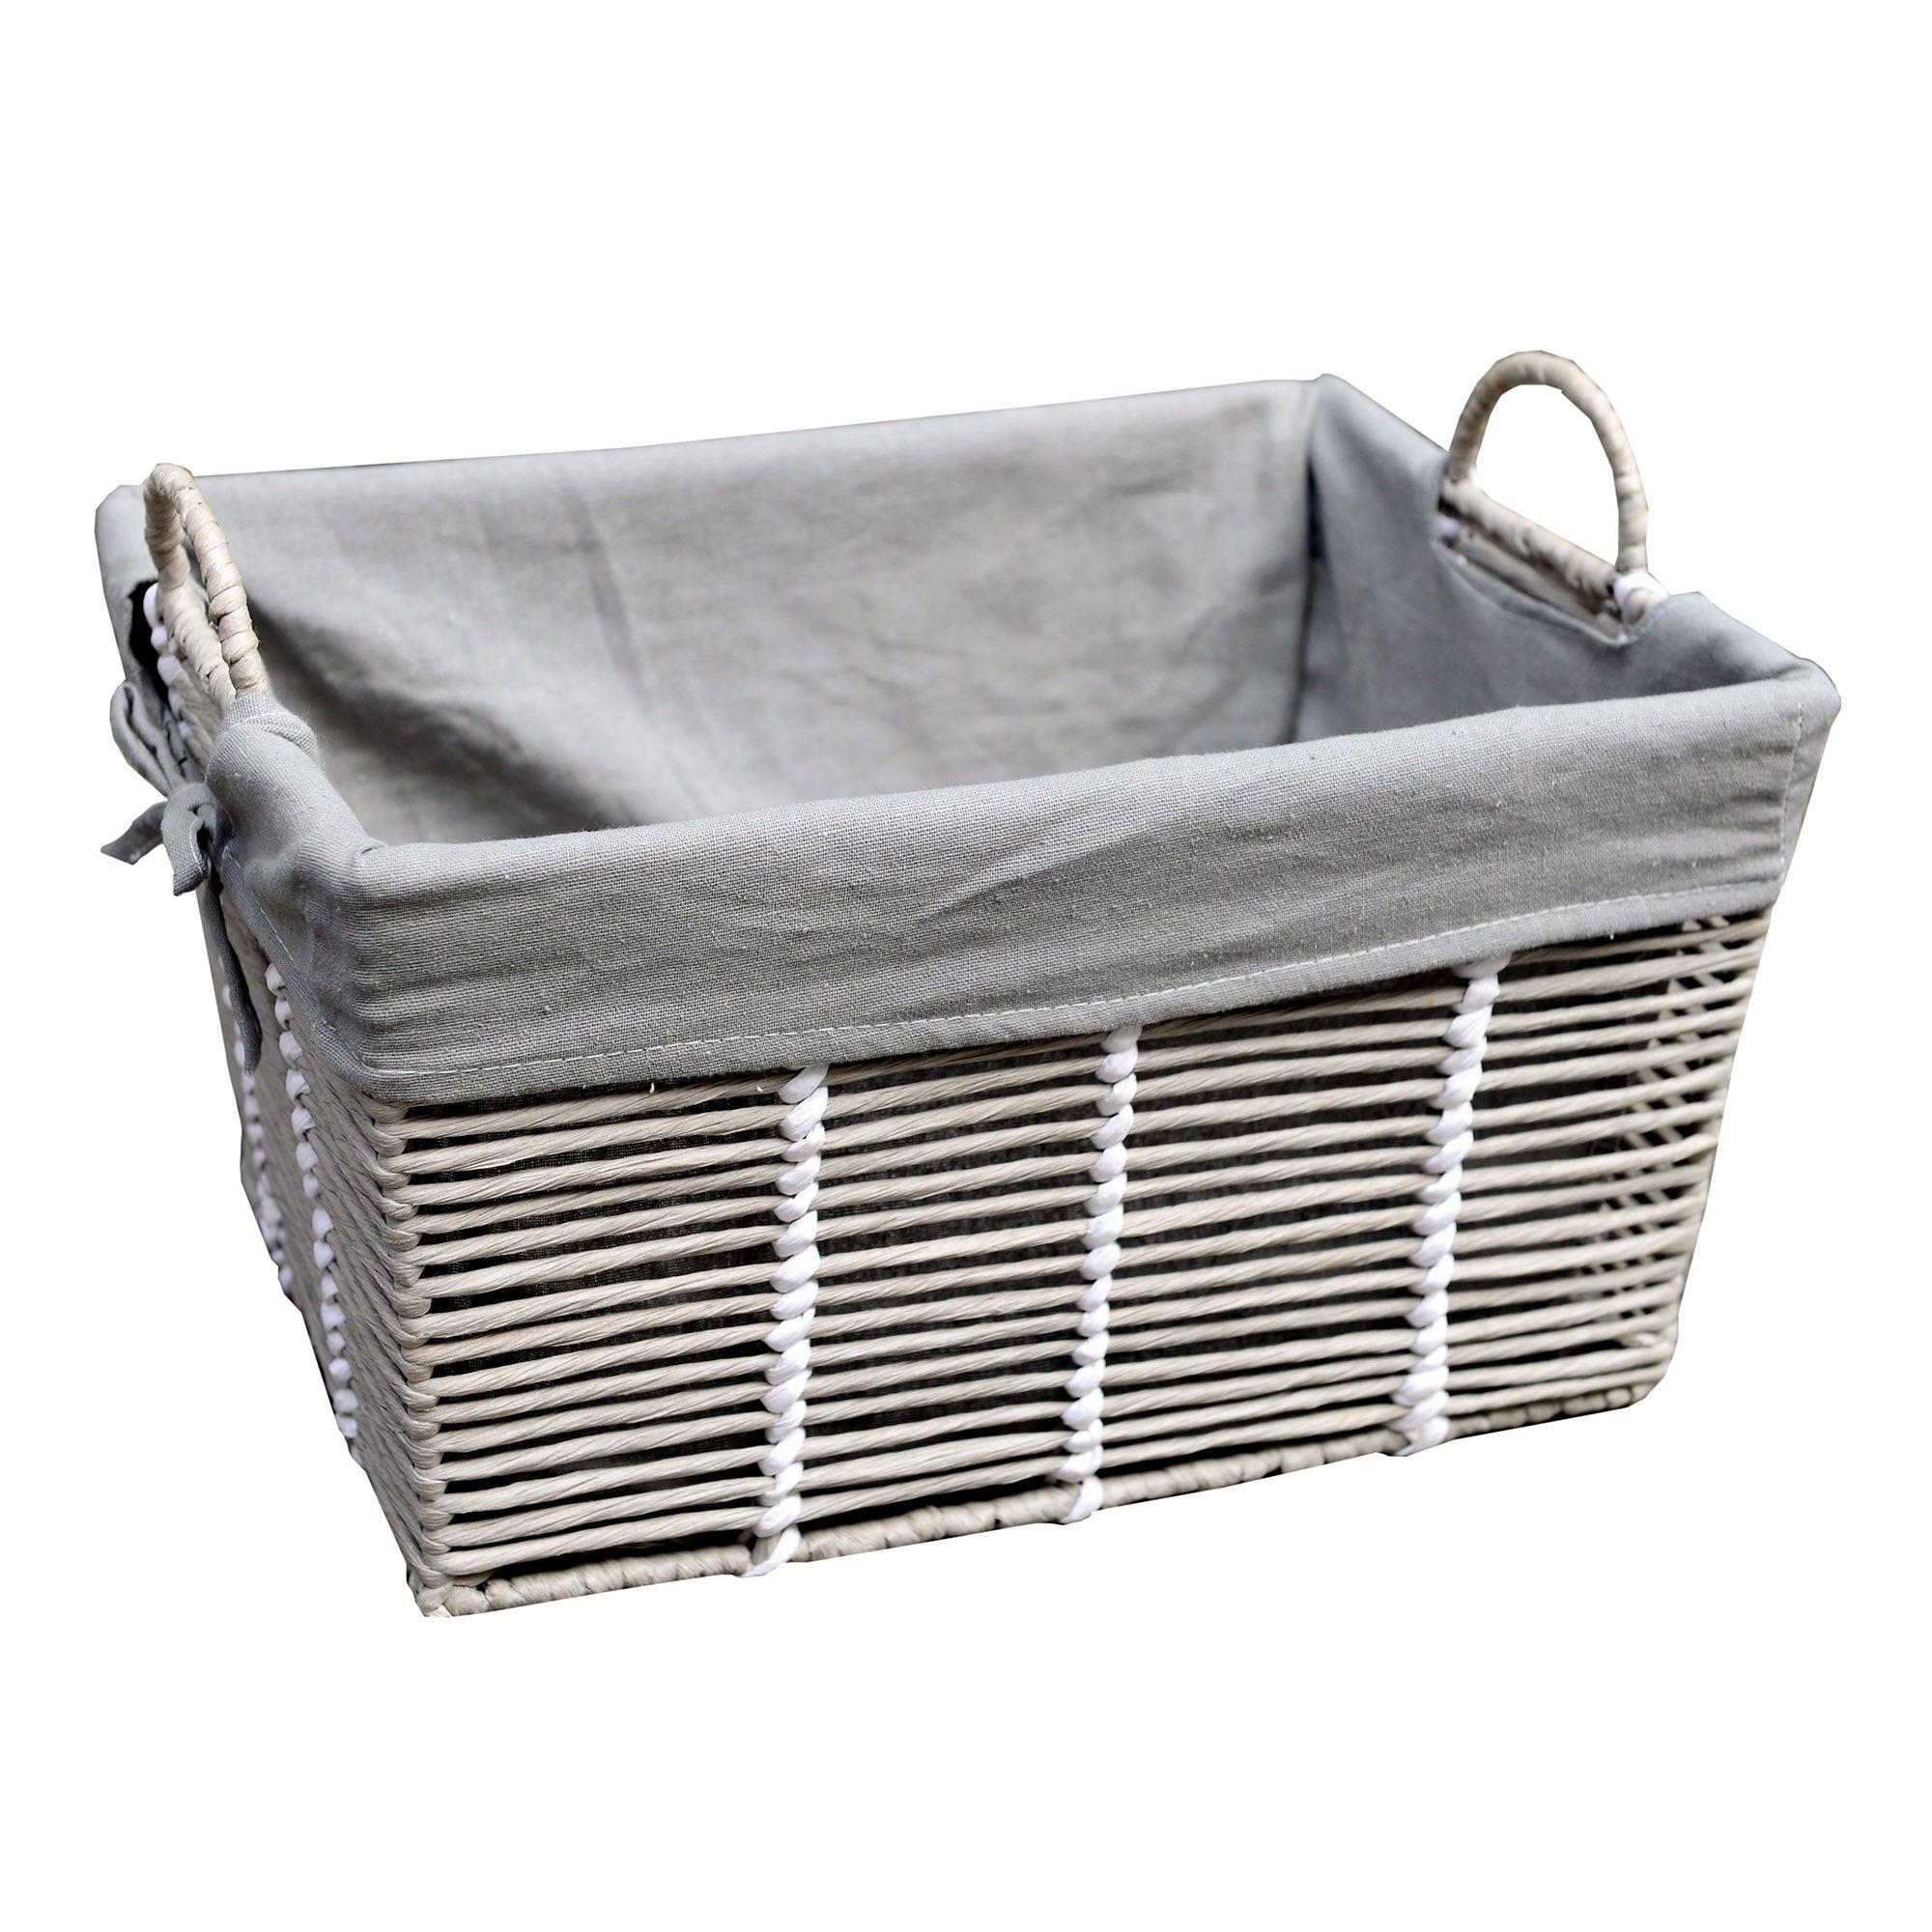 Purity Grey Basket with Handles